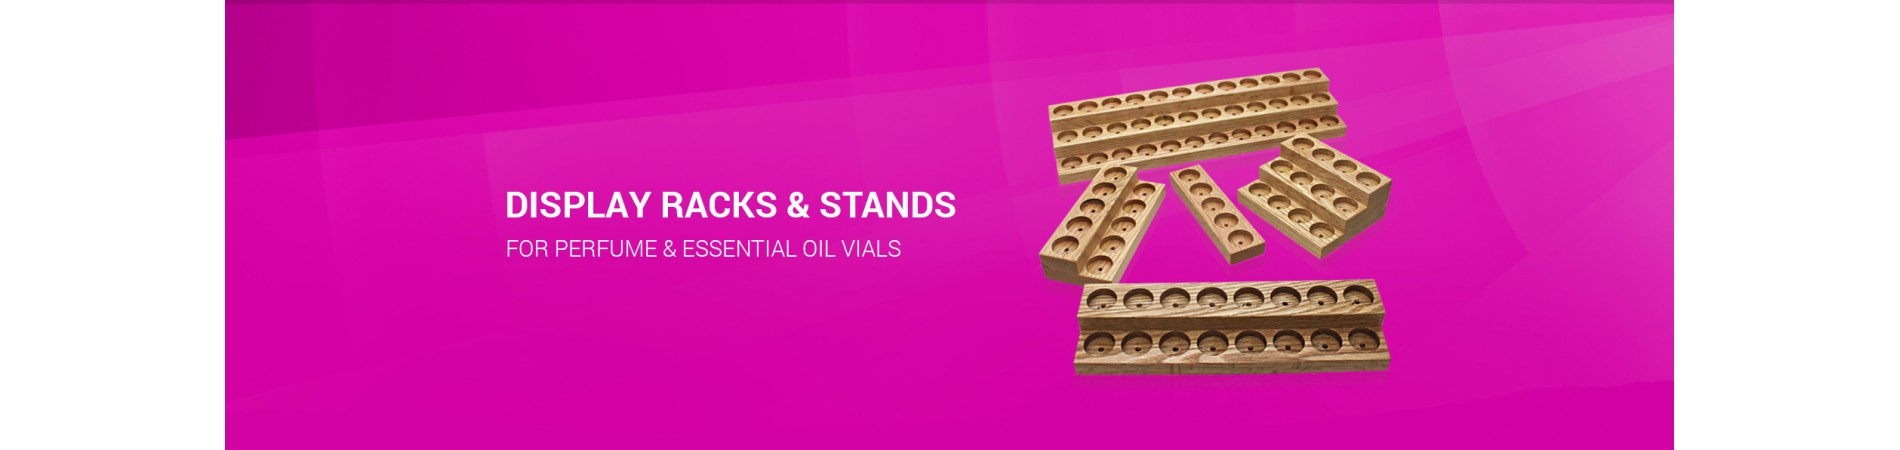 Display Racks & Stands for Perfume & Essential Oil Vials